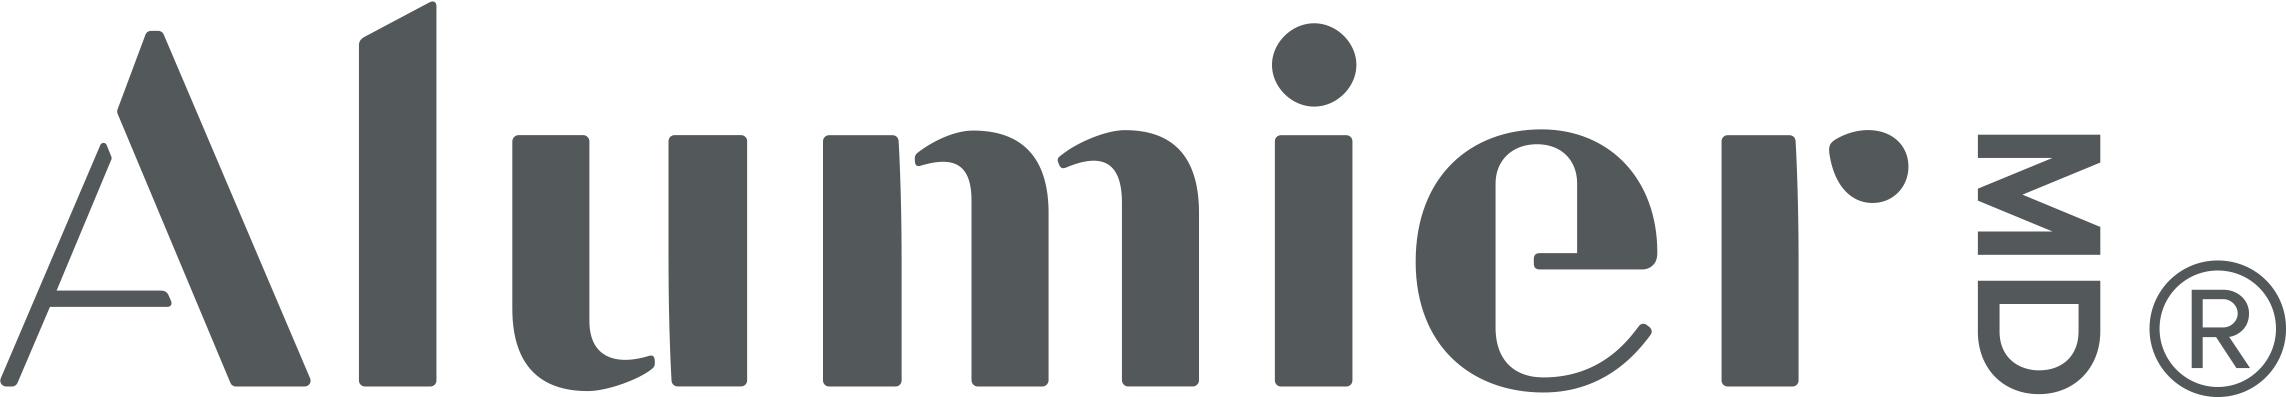 Alumier_MD-logo